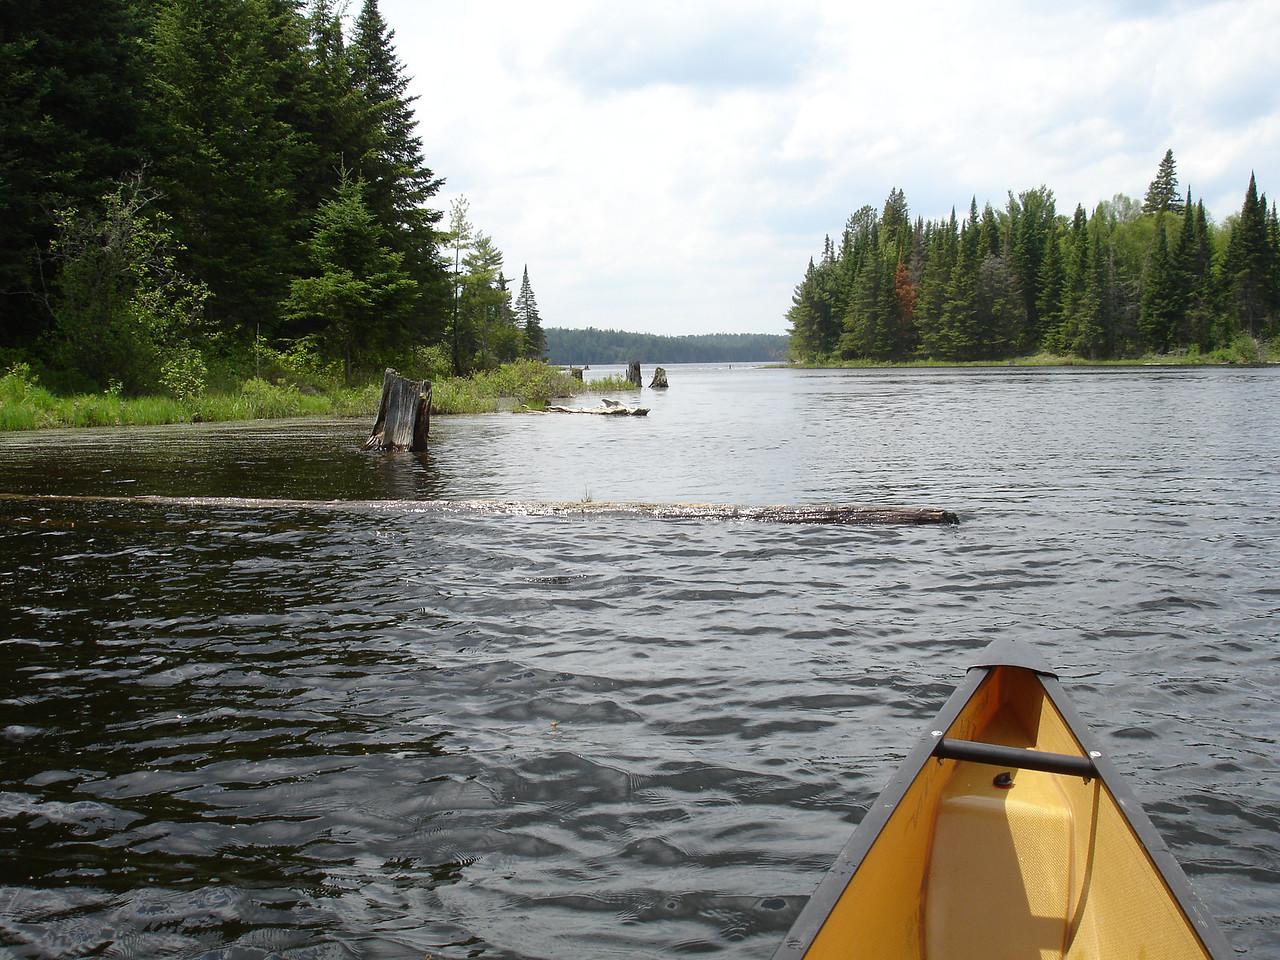 First glimpse of Tom Thomson Lake